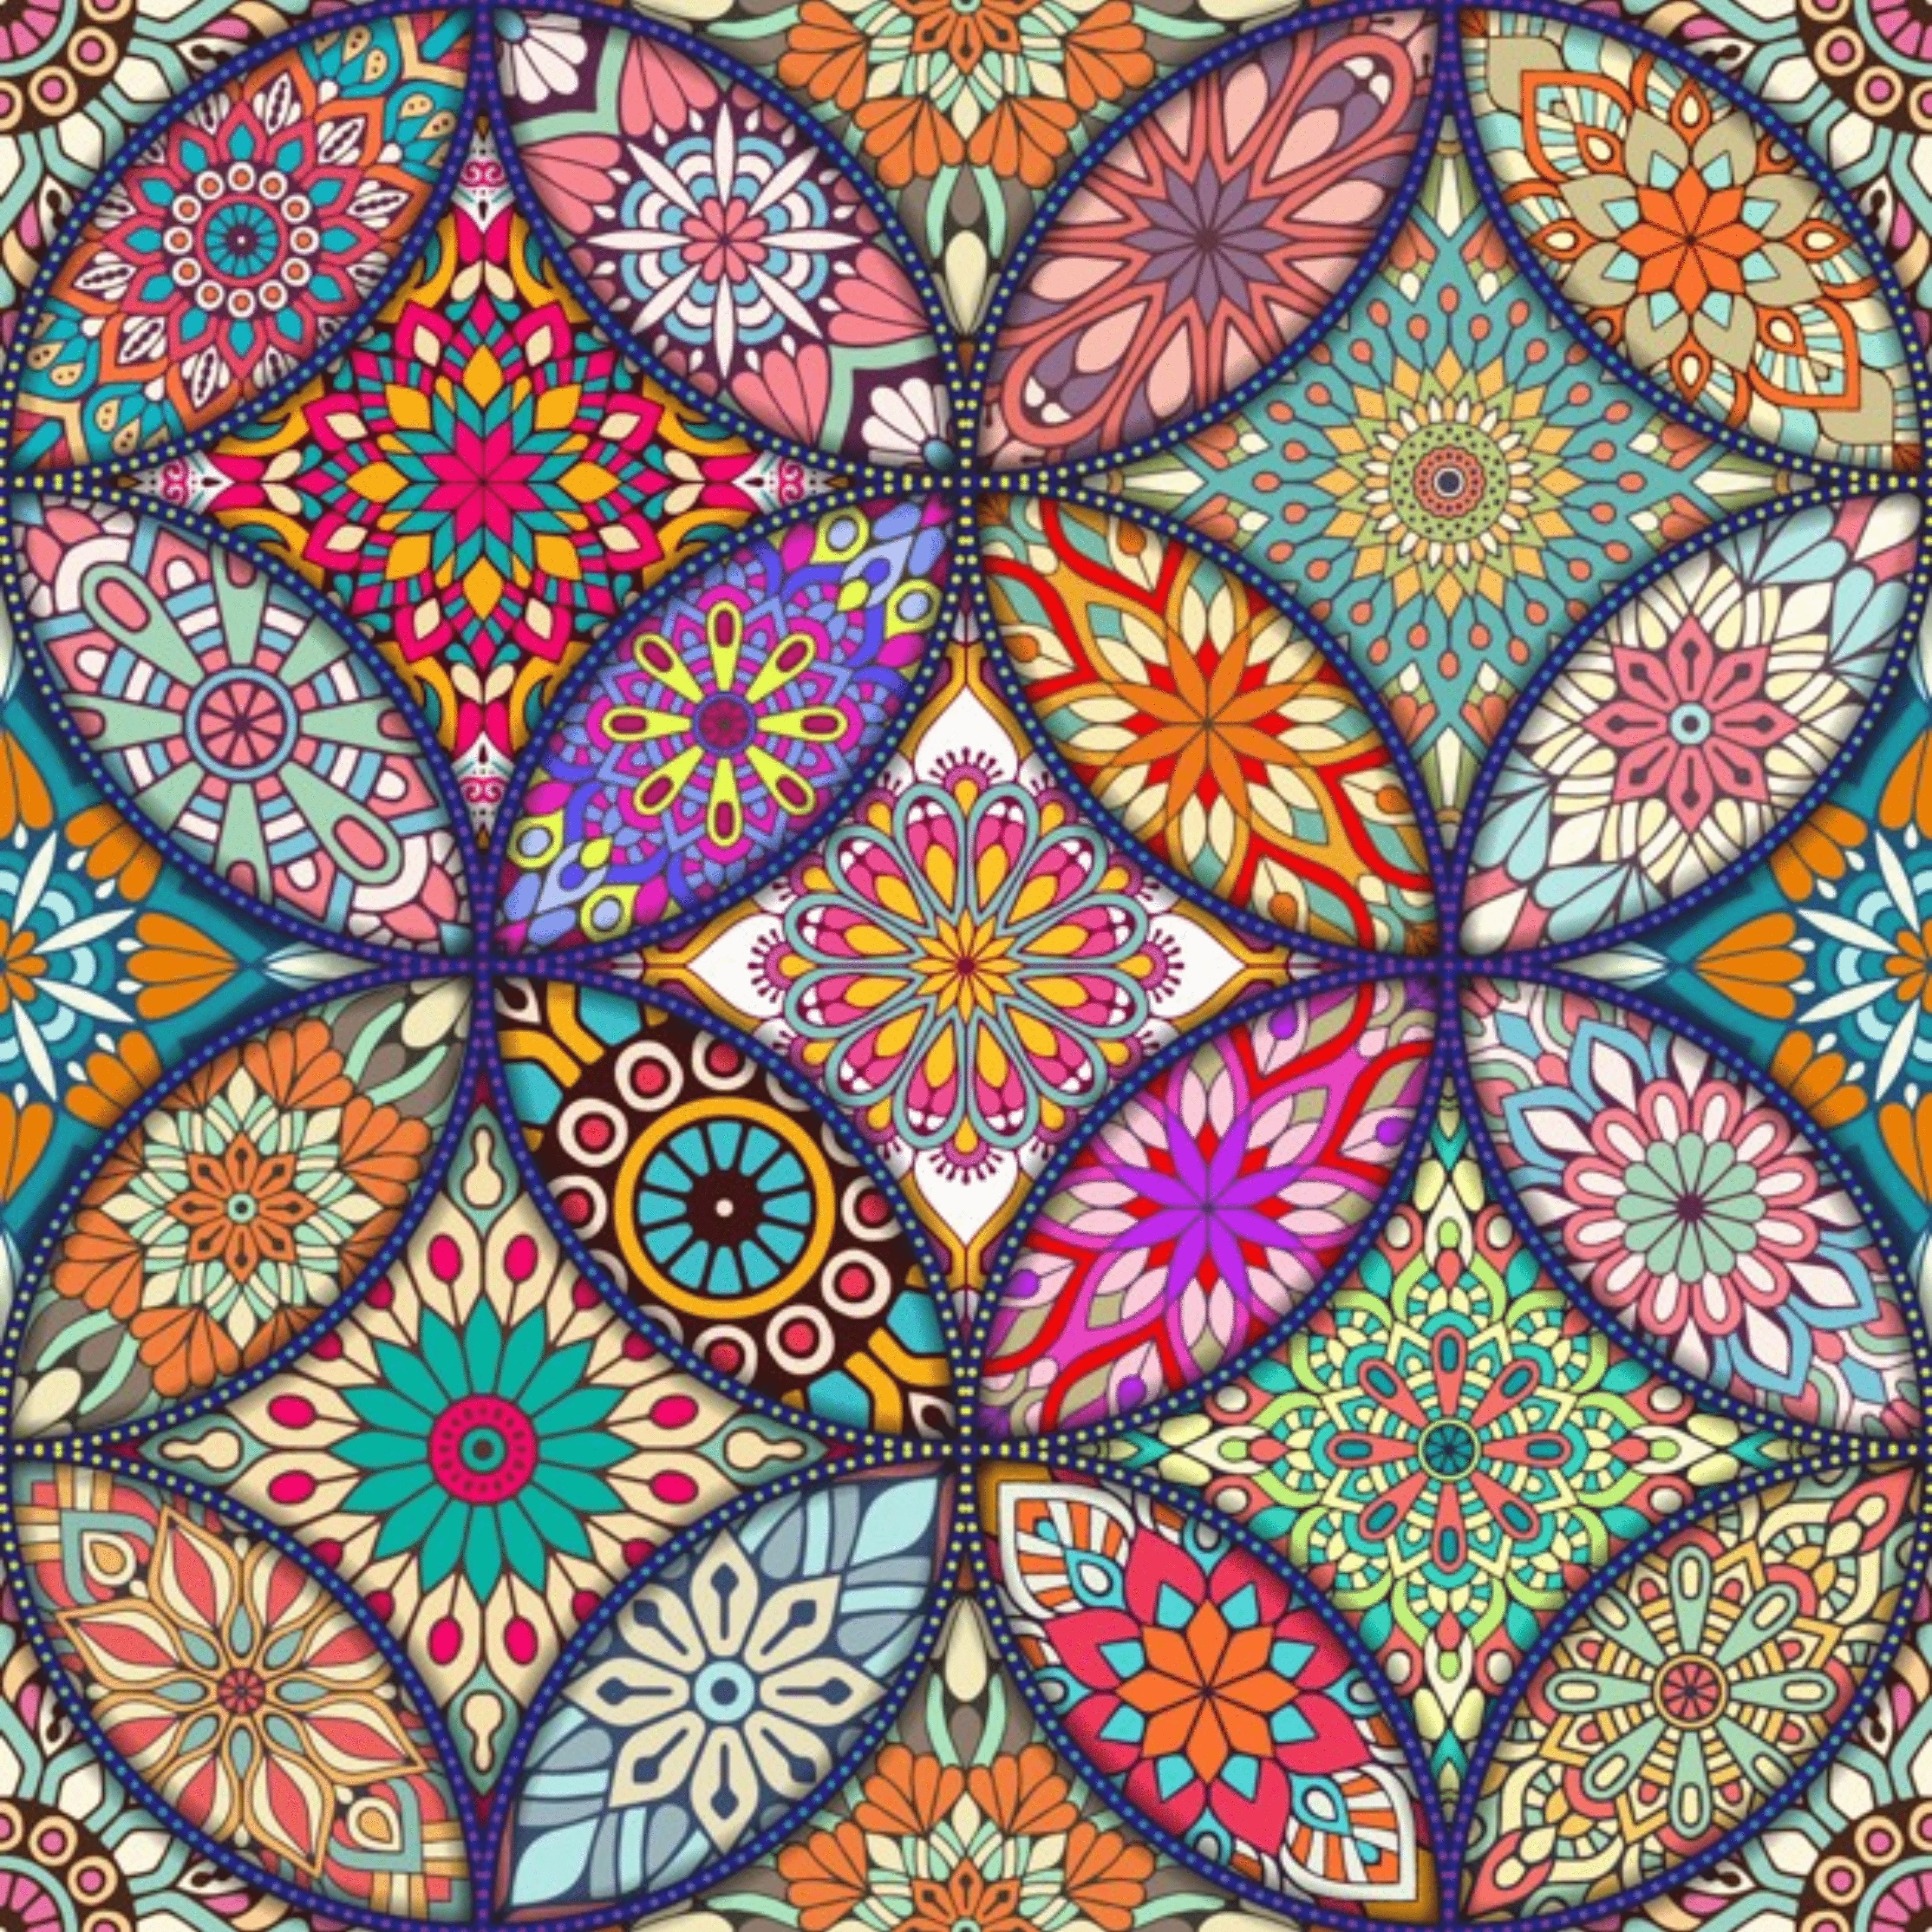 Pattern,                Textile,                Design,                Art,                Material,                Symmetry,                Circle,                Motif,                Visual,                Arts,                White,                Black,                Yellow,                 Free Image